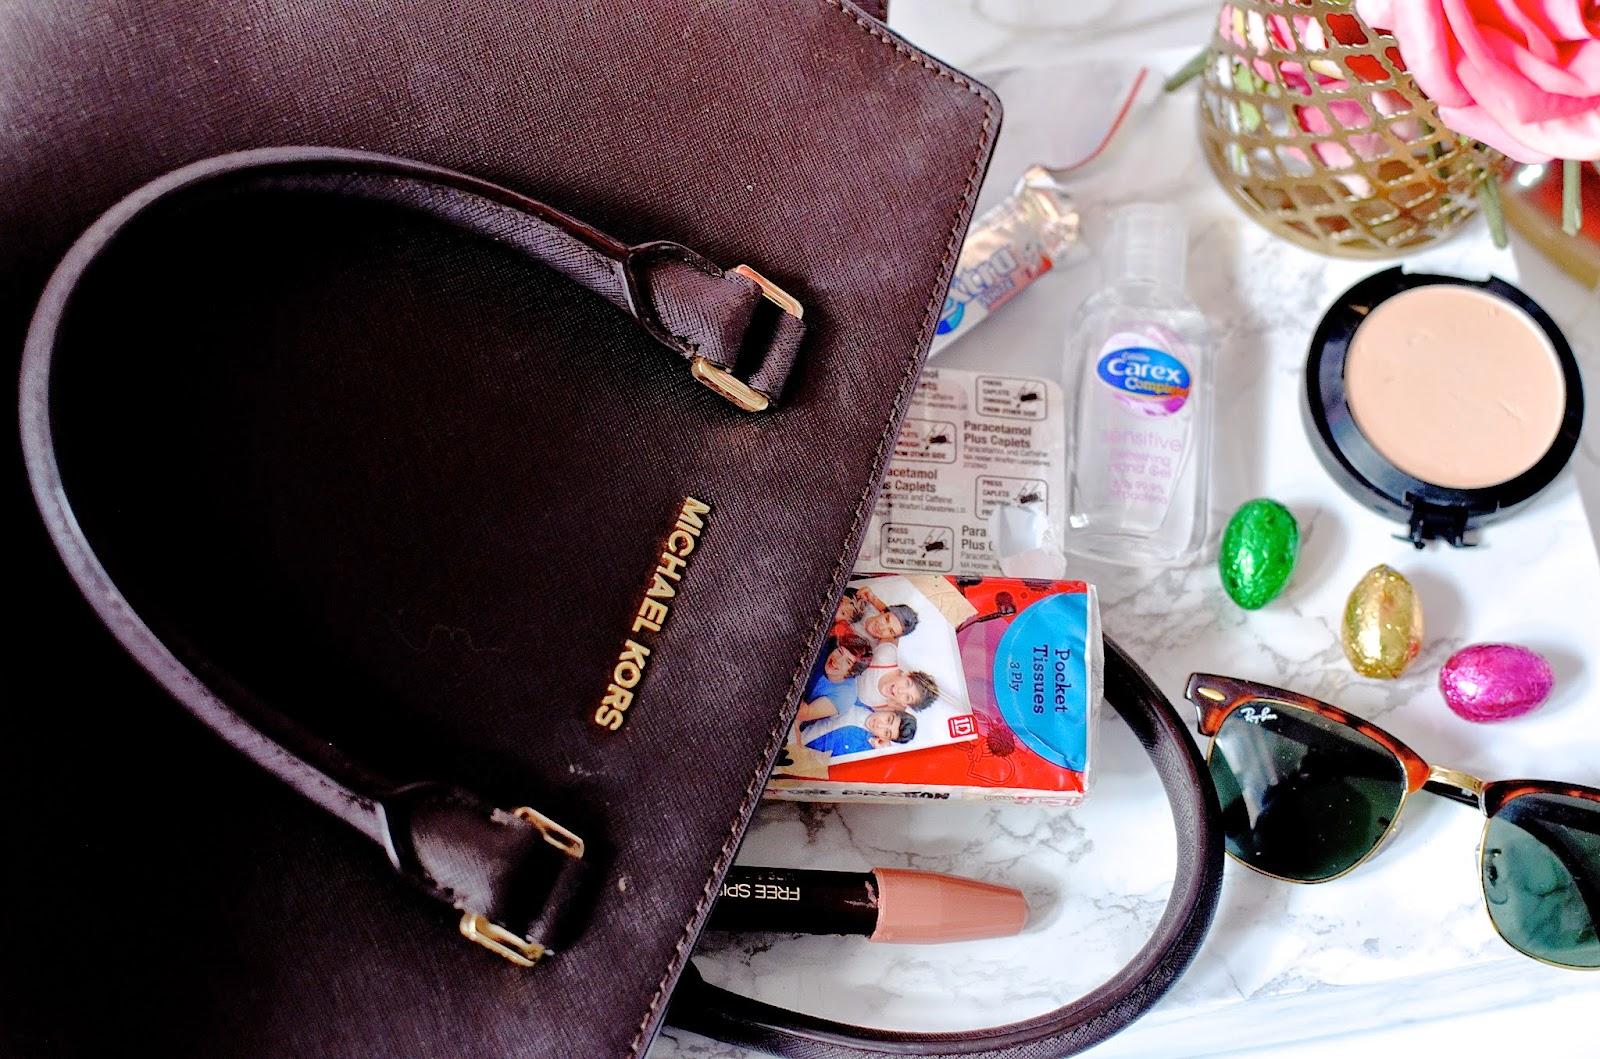 micheal kors, micheal kors selma bag, whats in my handbag, handbag essentials, handbag